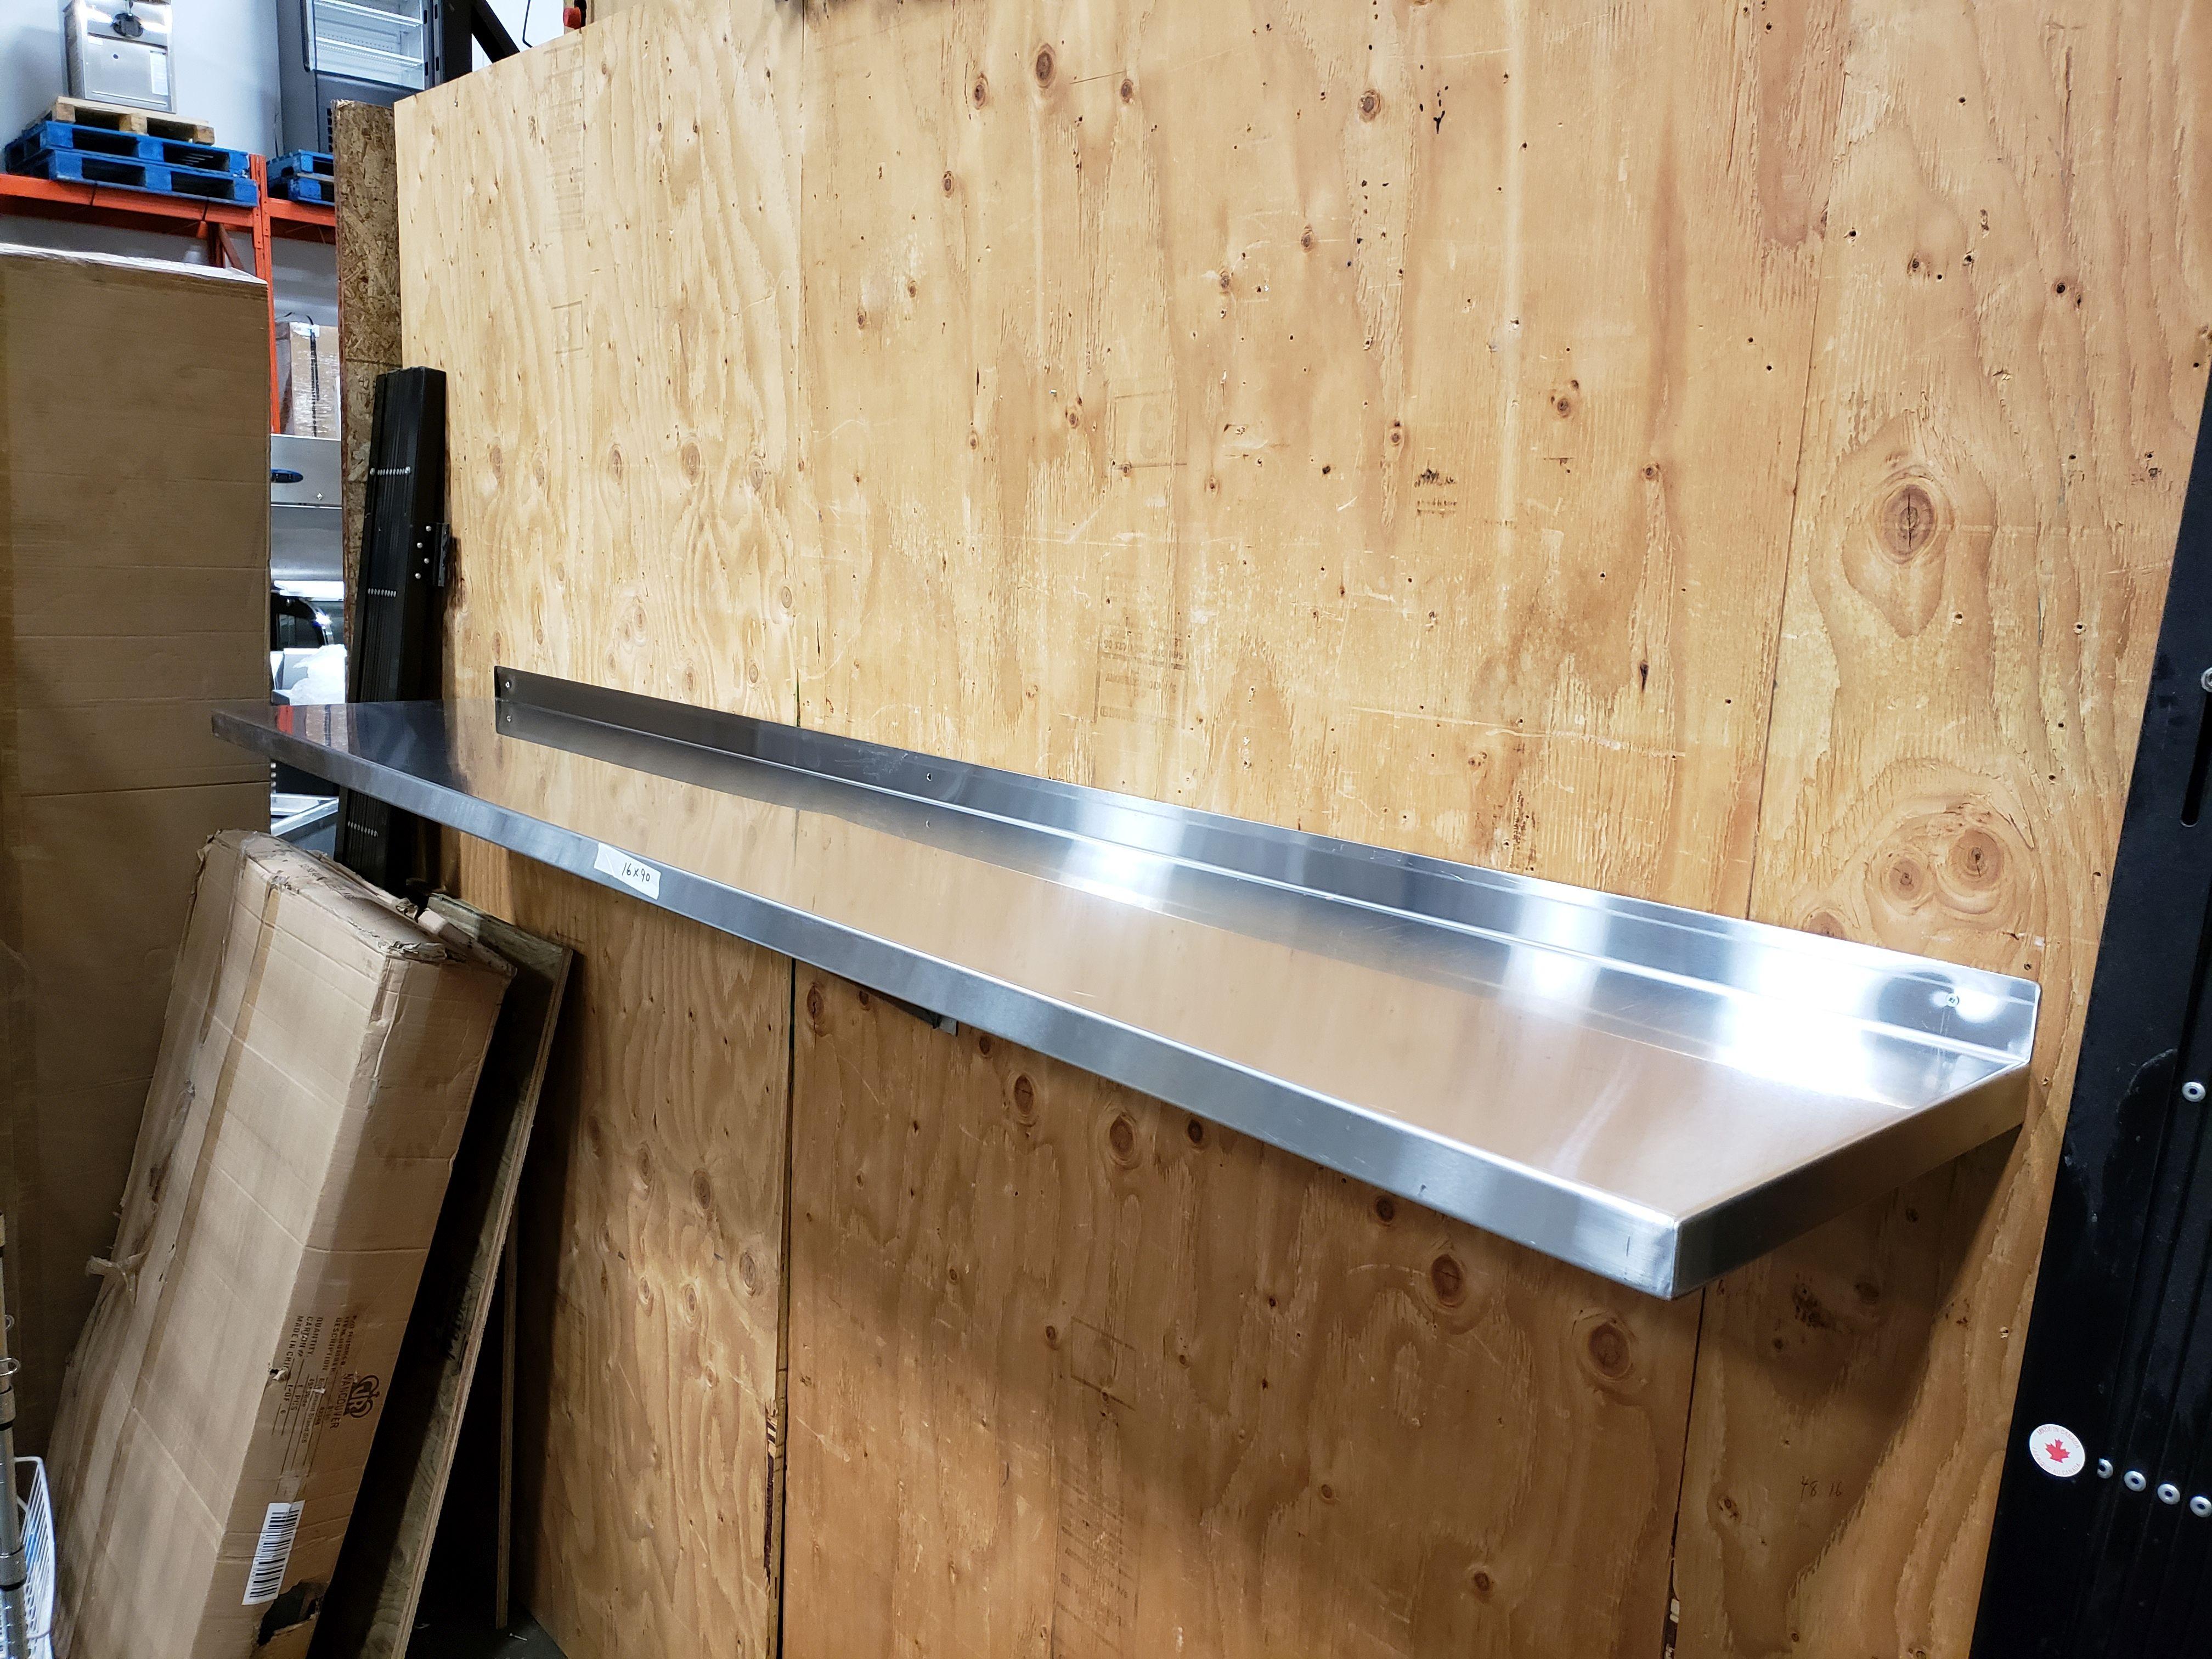 "Lot 29 - 16"" x 90"" Stainless Steel Wall Shelf"